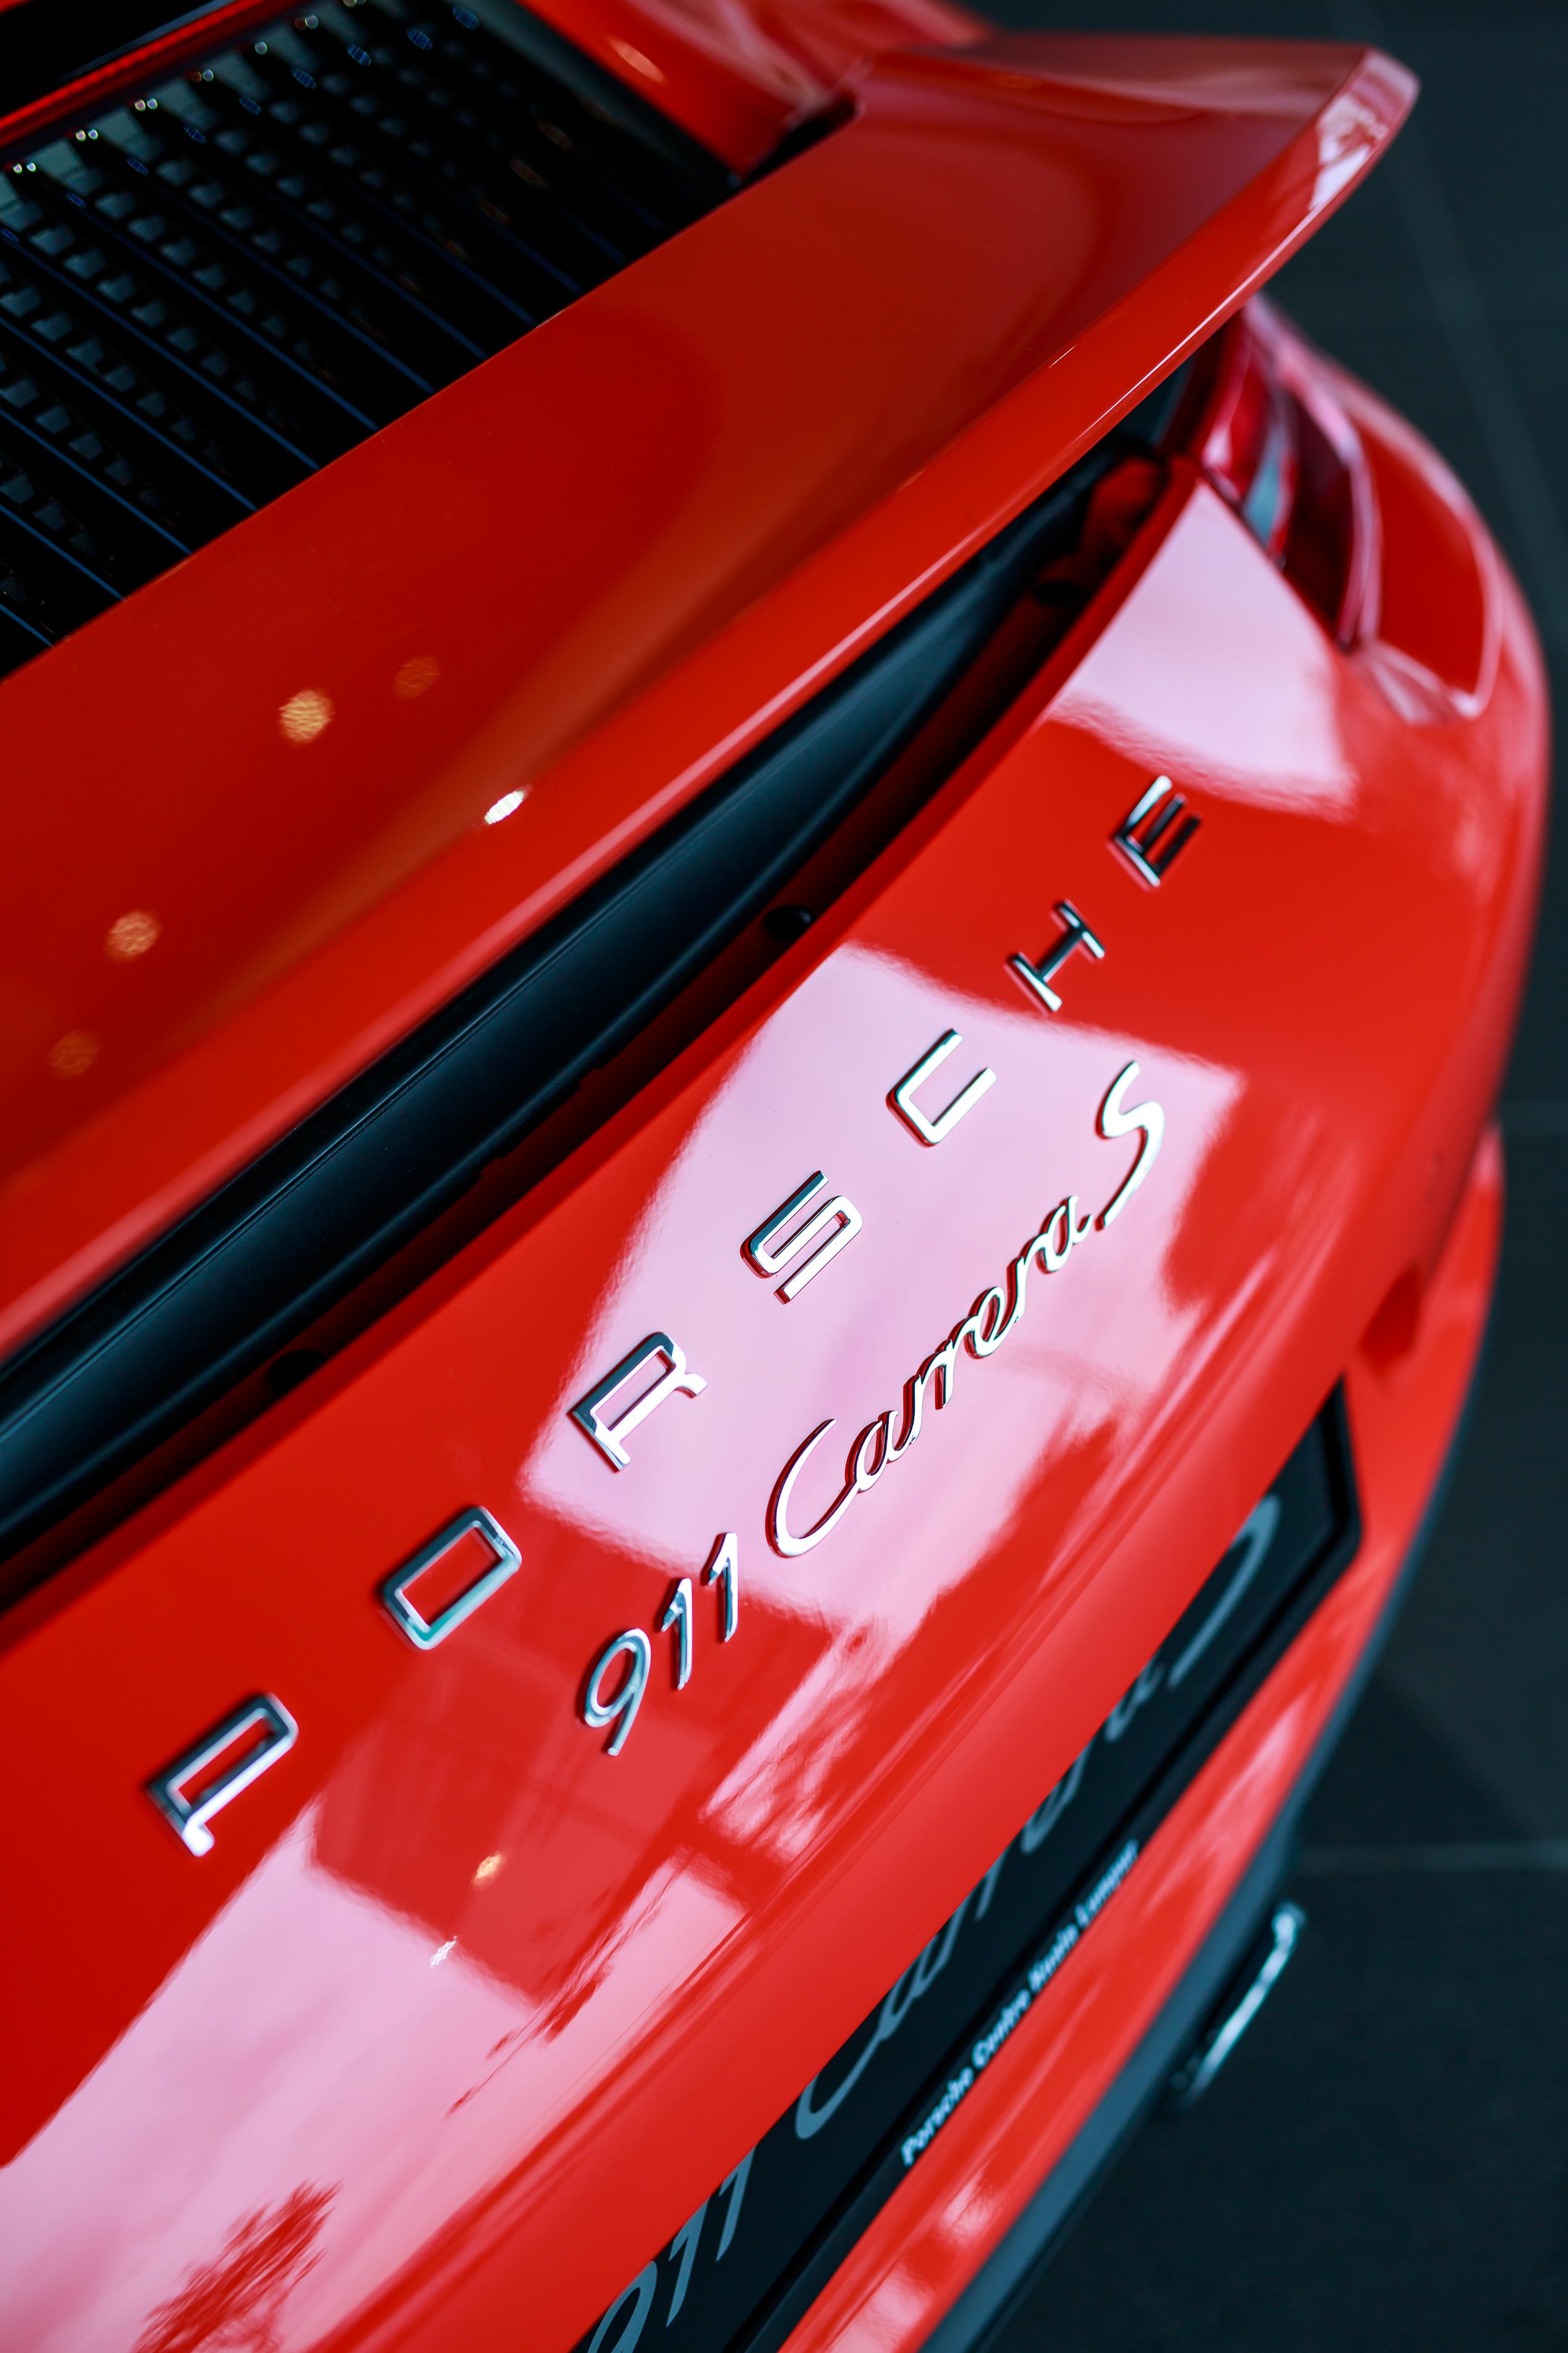 Porsche 911 Baharu Dilancarkan Di Malaysia Enjin Turbo 3 0l Baharu Tiga Varian Harga Dari